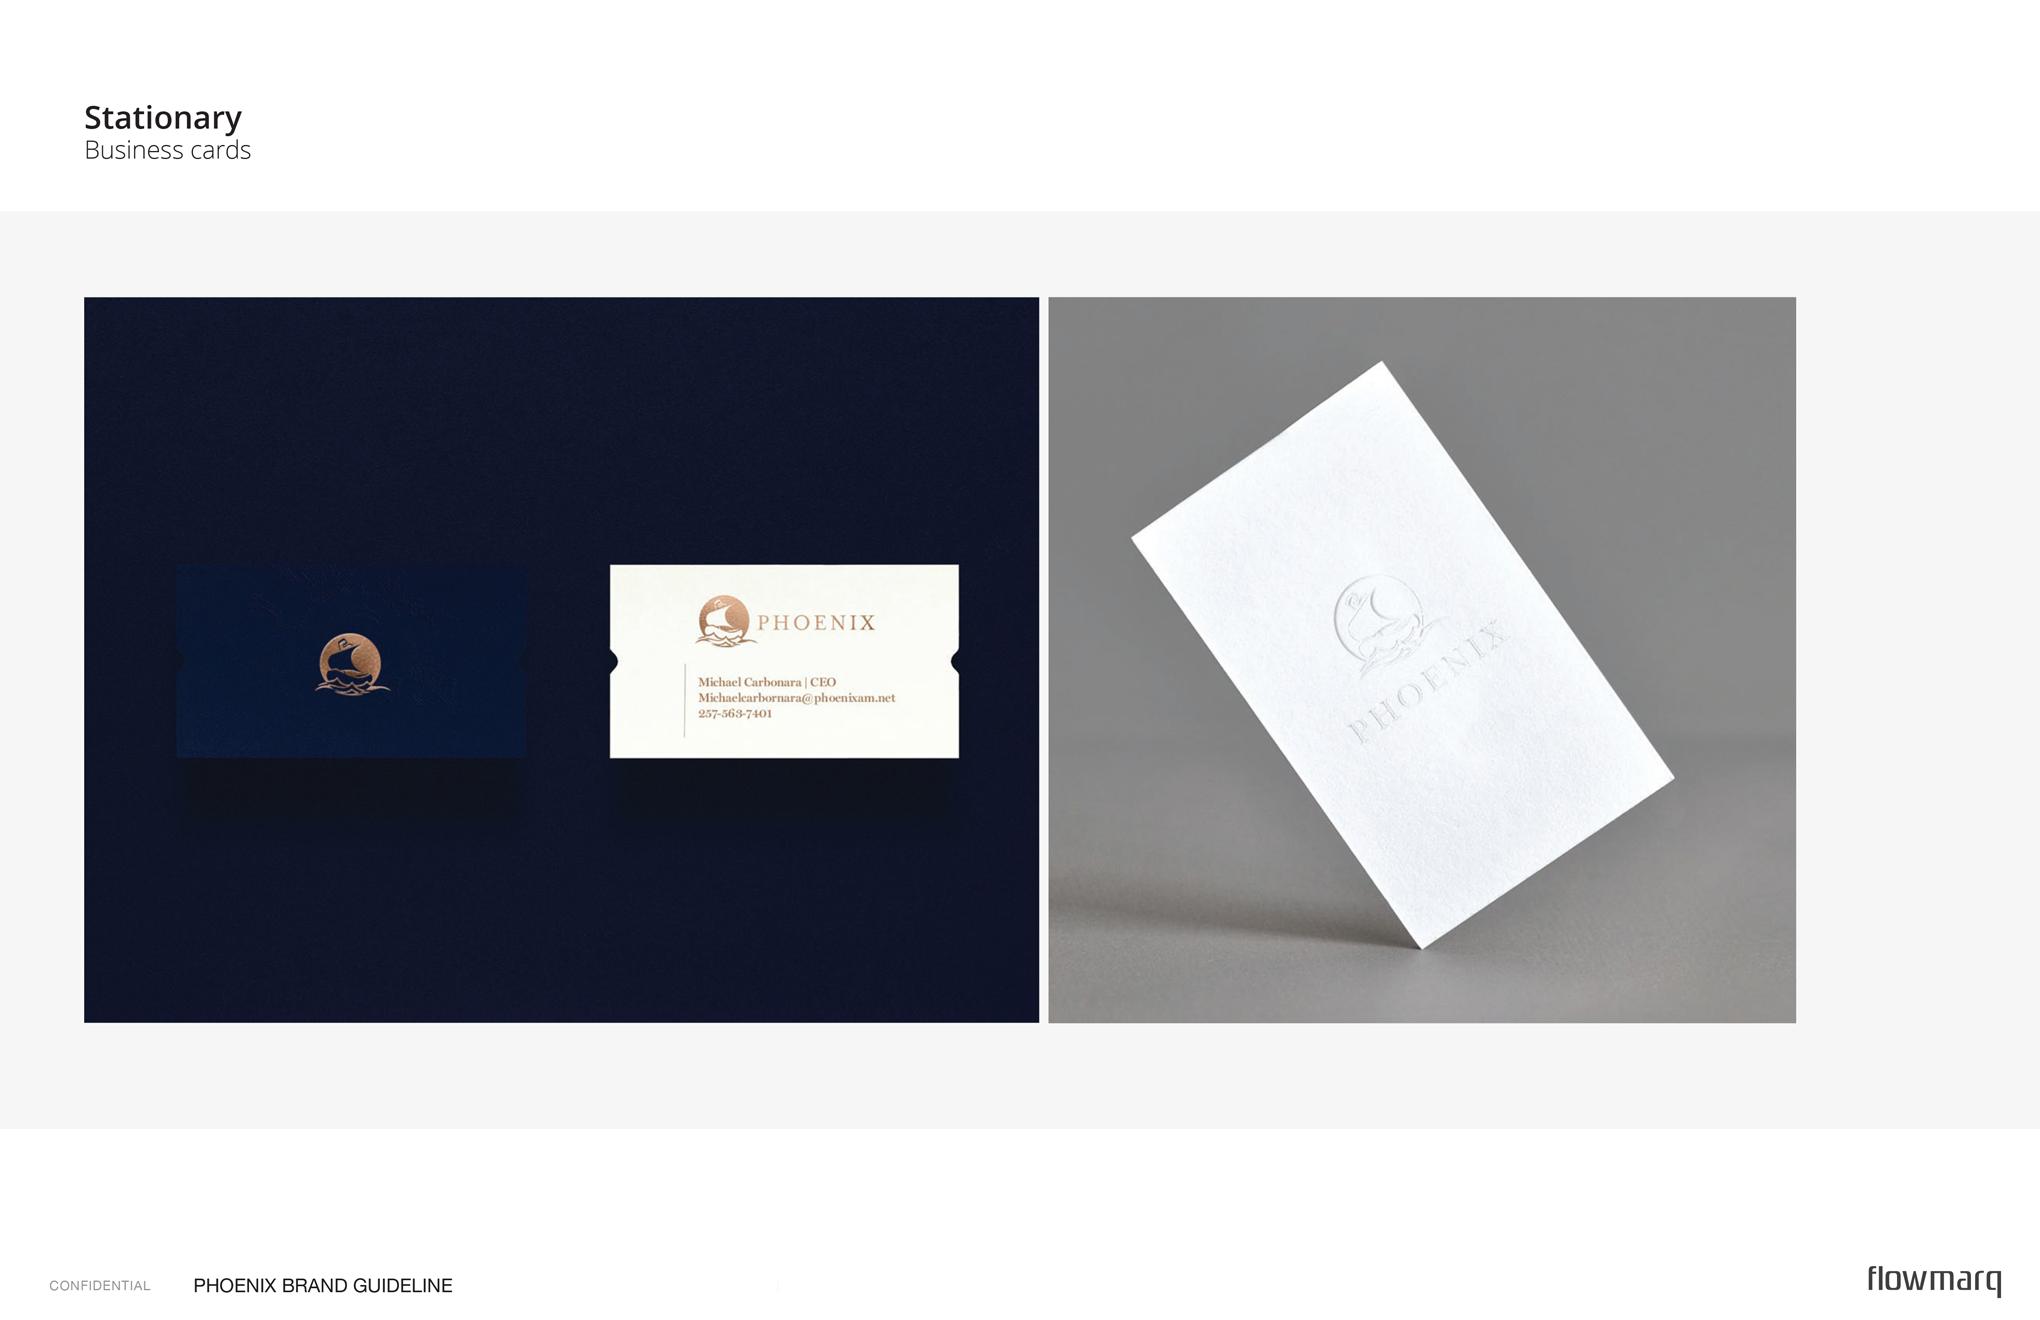 Phoenix - branded business card designs